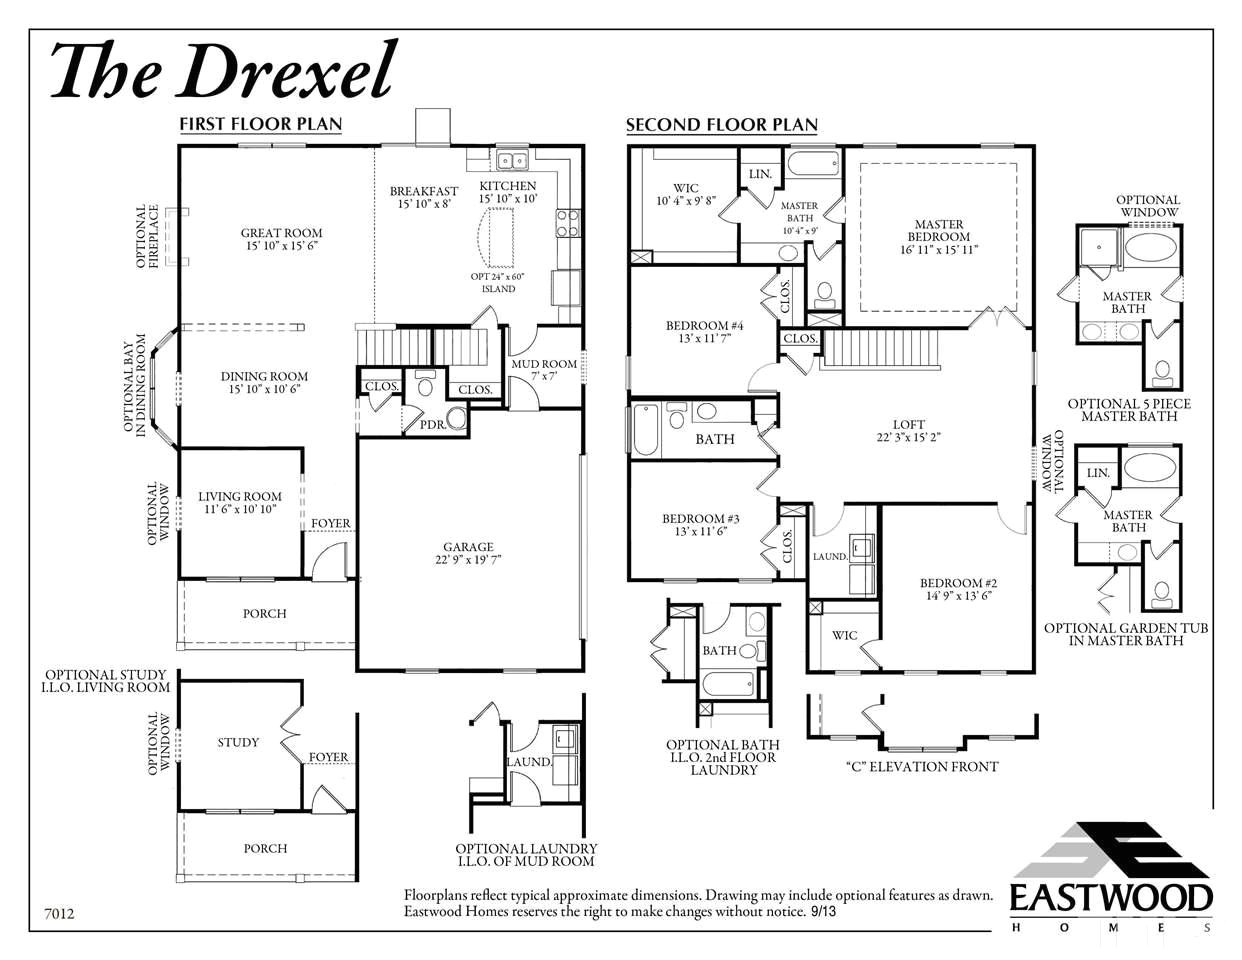 Eastwood Homes Cypress Floor Plan Eastwood Homes Drexel Floor Plan Home Design and Style